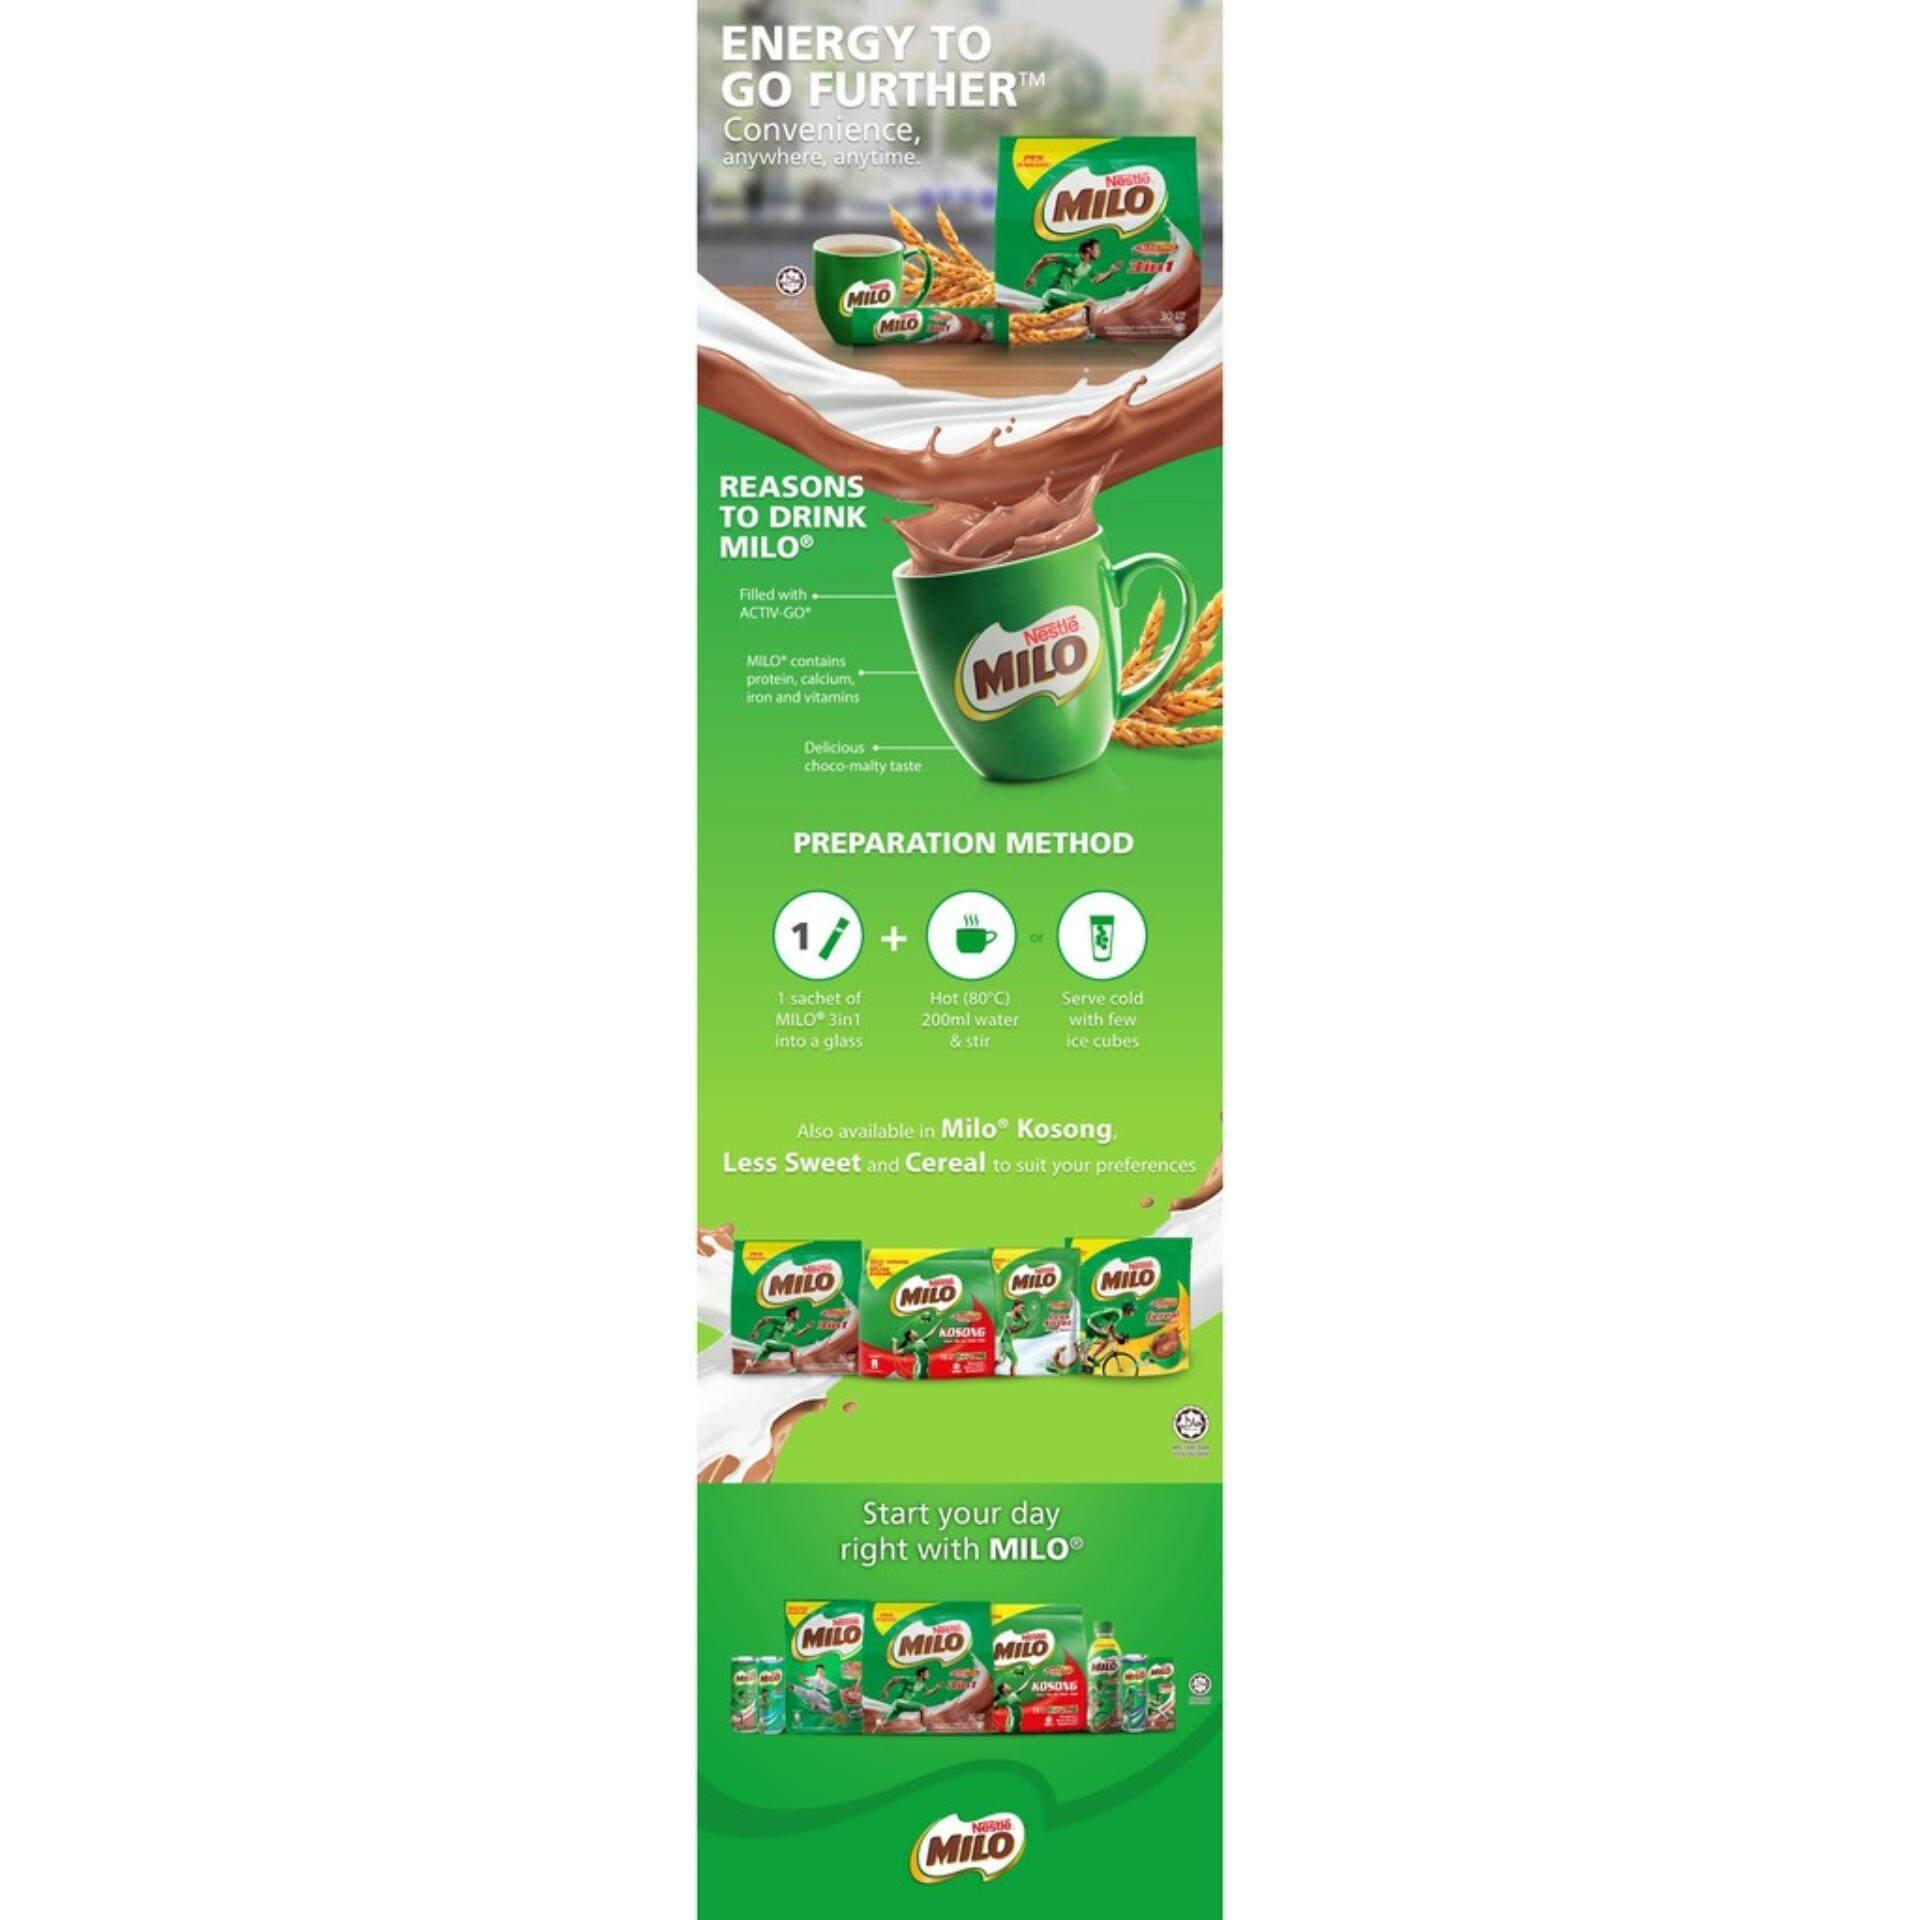 Milo Activ Go Minuman Susu 33 G 21 Sachet Daftar Harga Terbaru Dan 18g 10sachet Gratis 1sachet Nestle 3in1 30 Sticks 33g X2 Packs 5